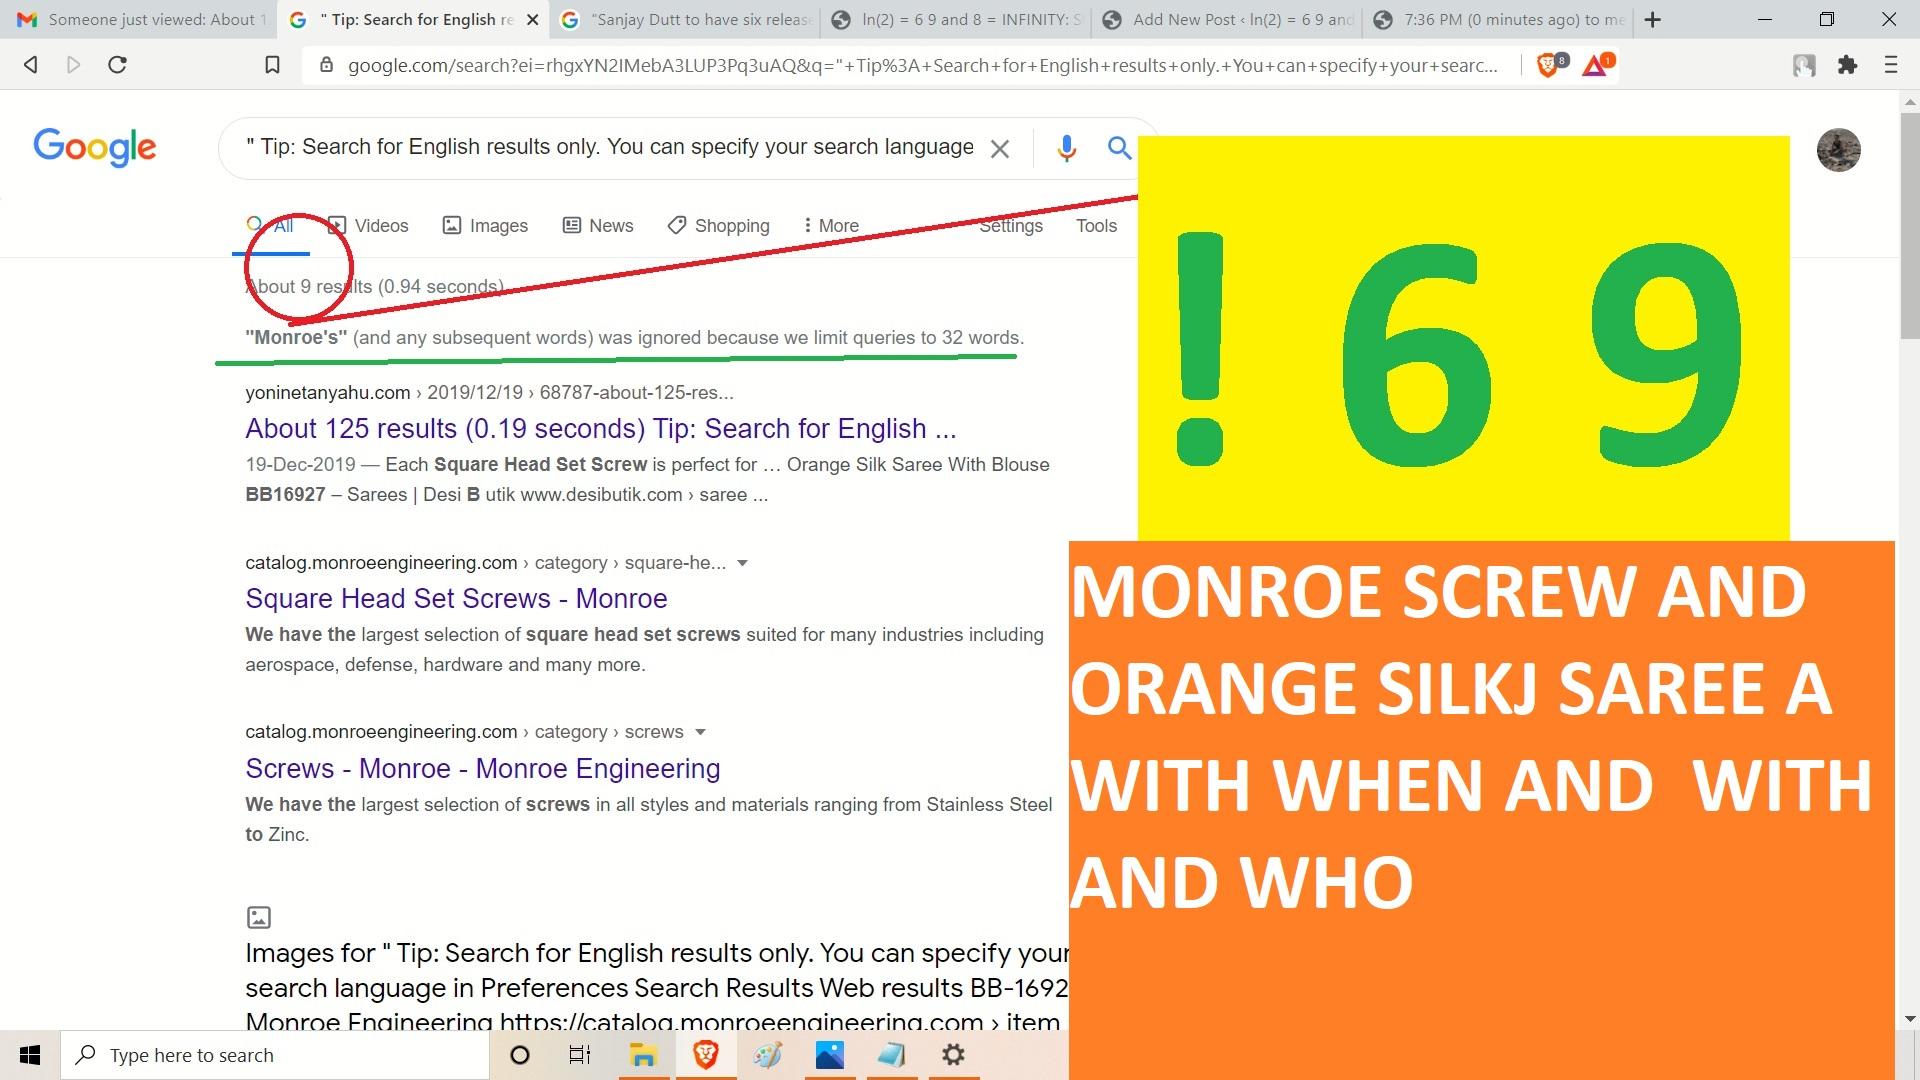 MONROE SCREW AND ORANGE SILJ SAREEA WITH AND WHO